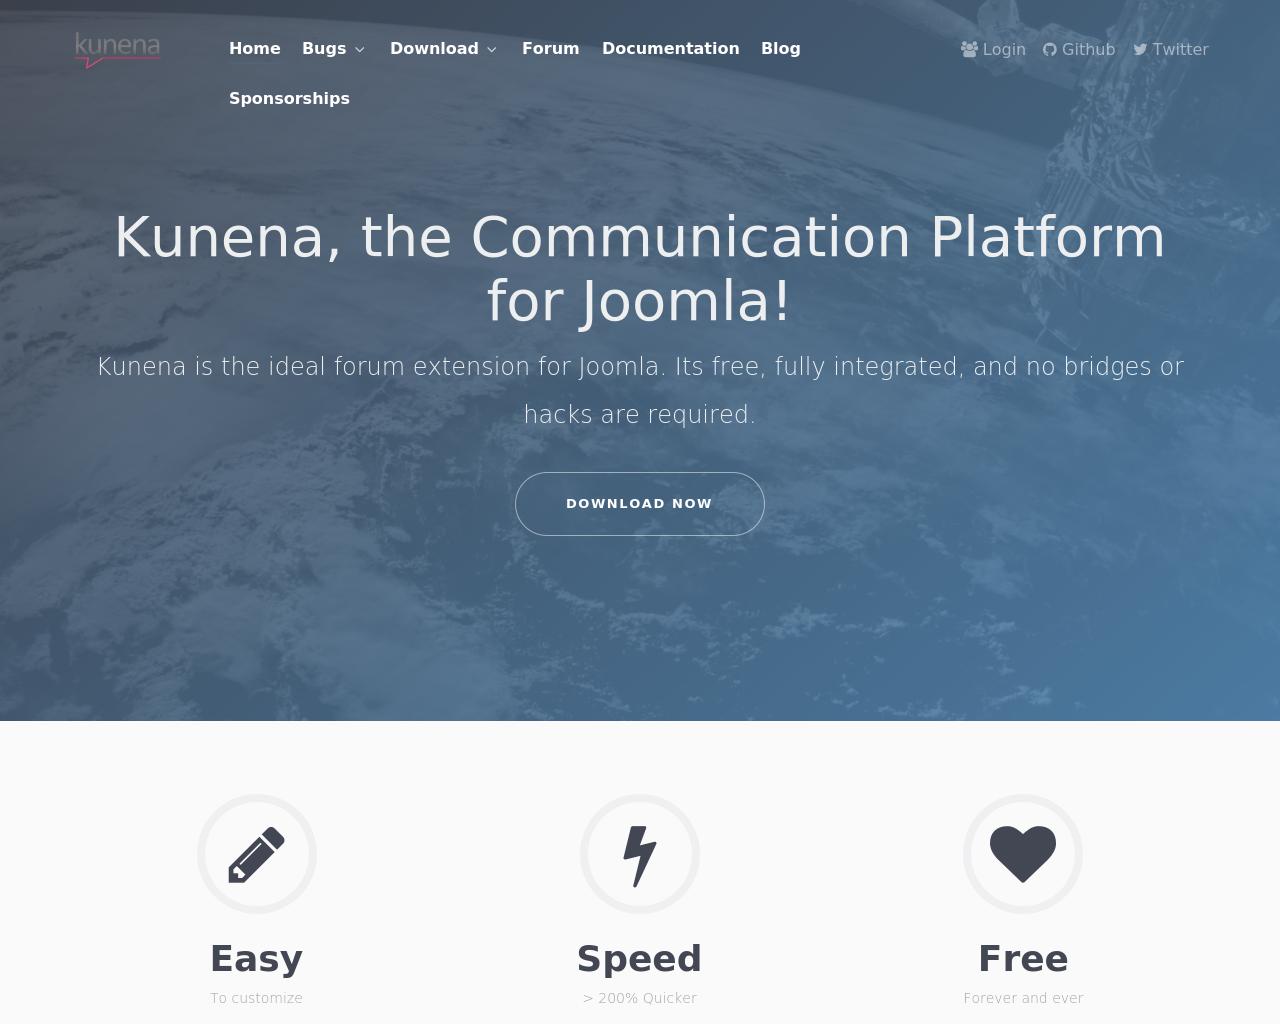 Kunena-Forum-Advertising-Reviews-Pricing